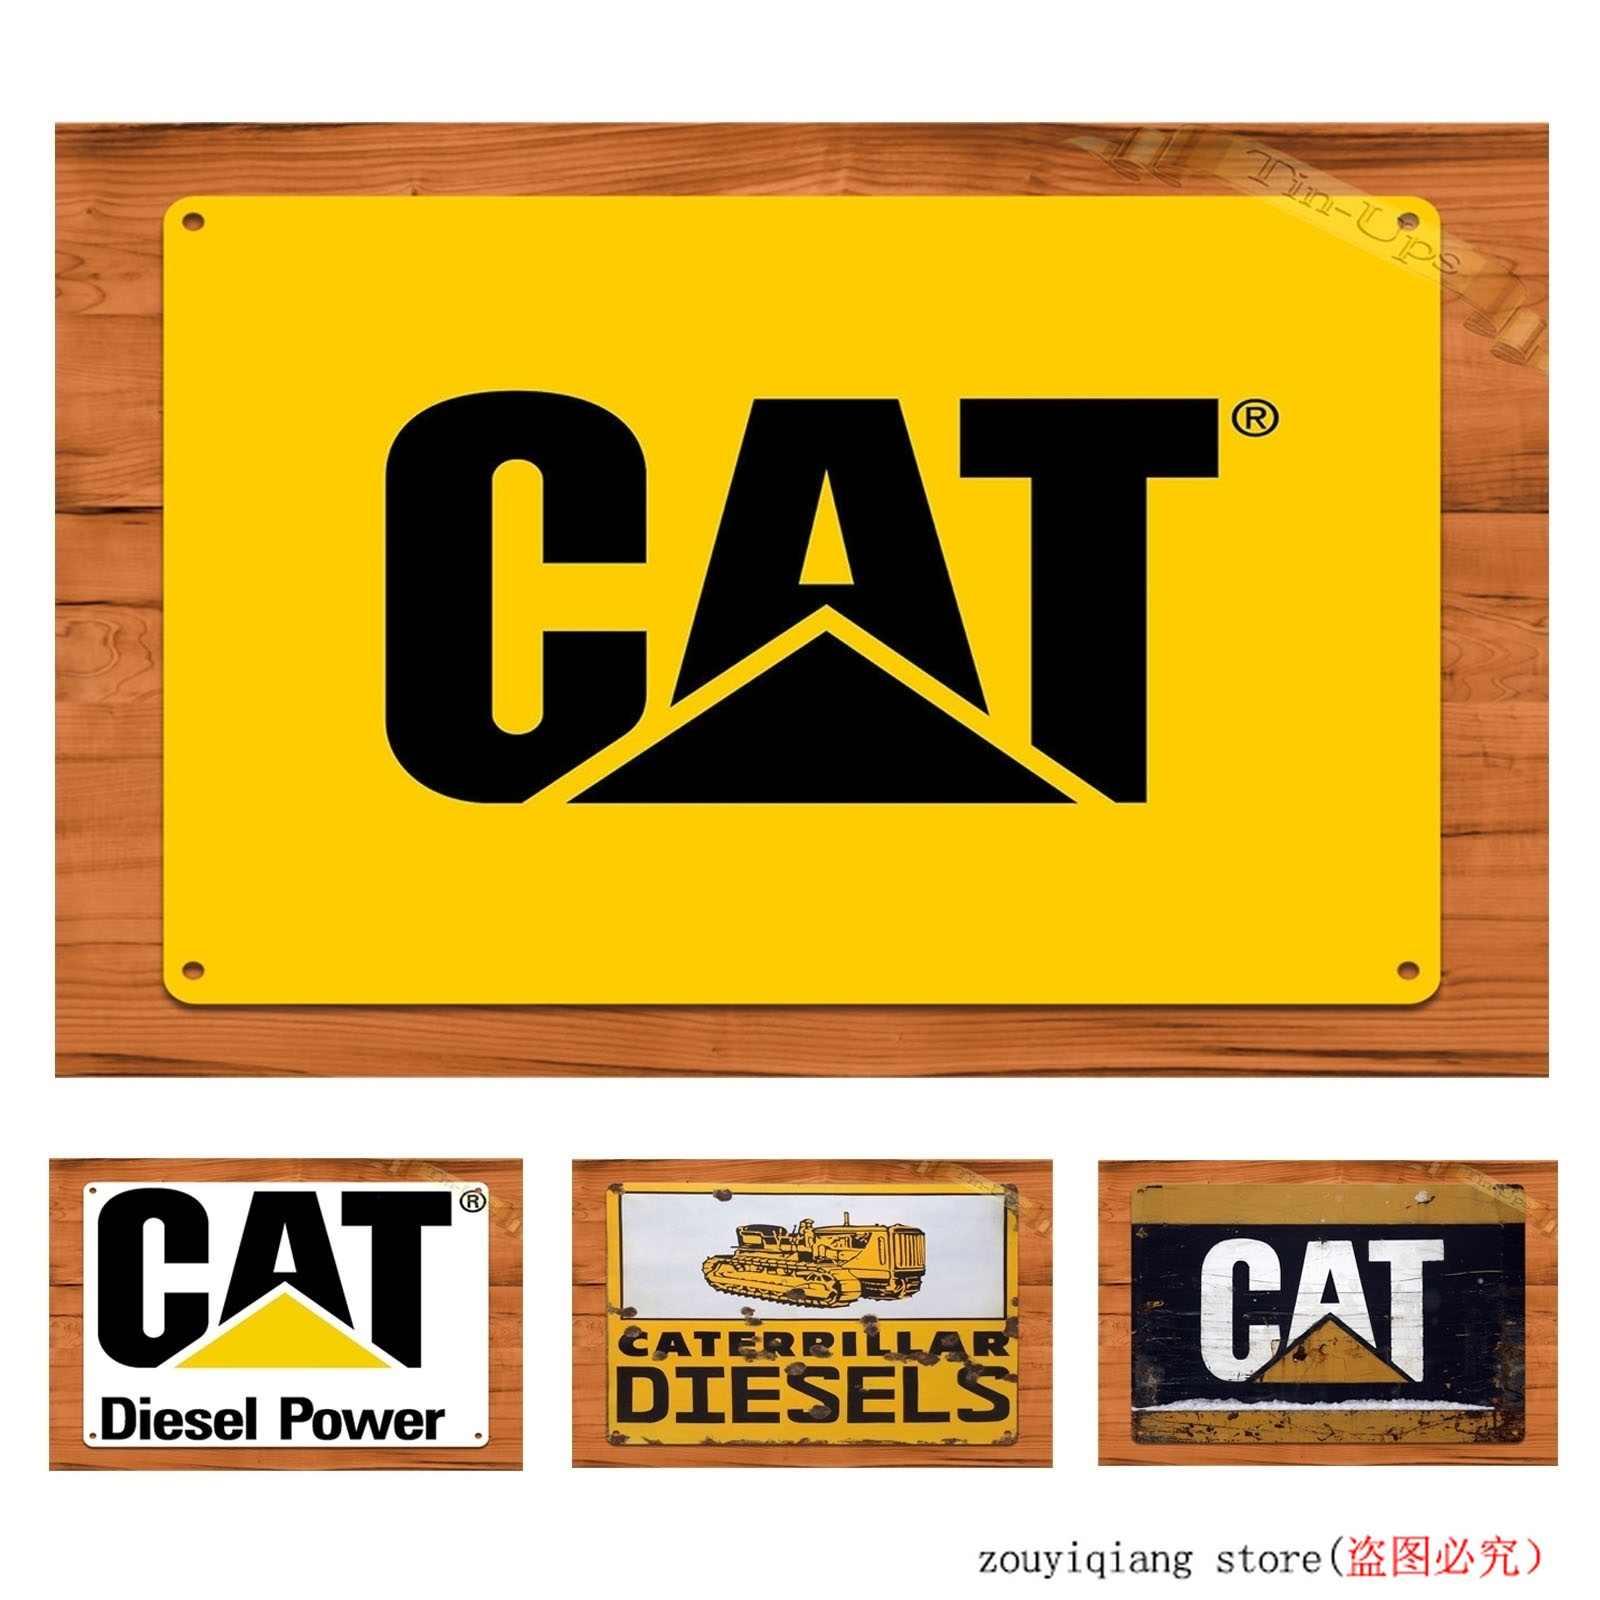 Caterpillar CAT logo wall art sign